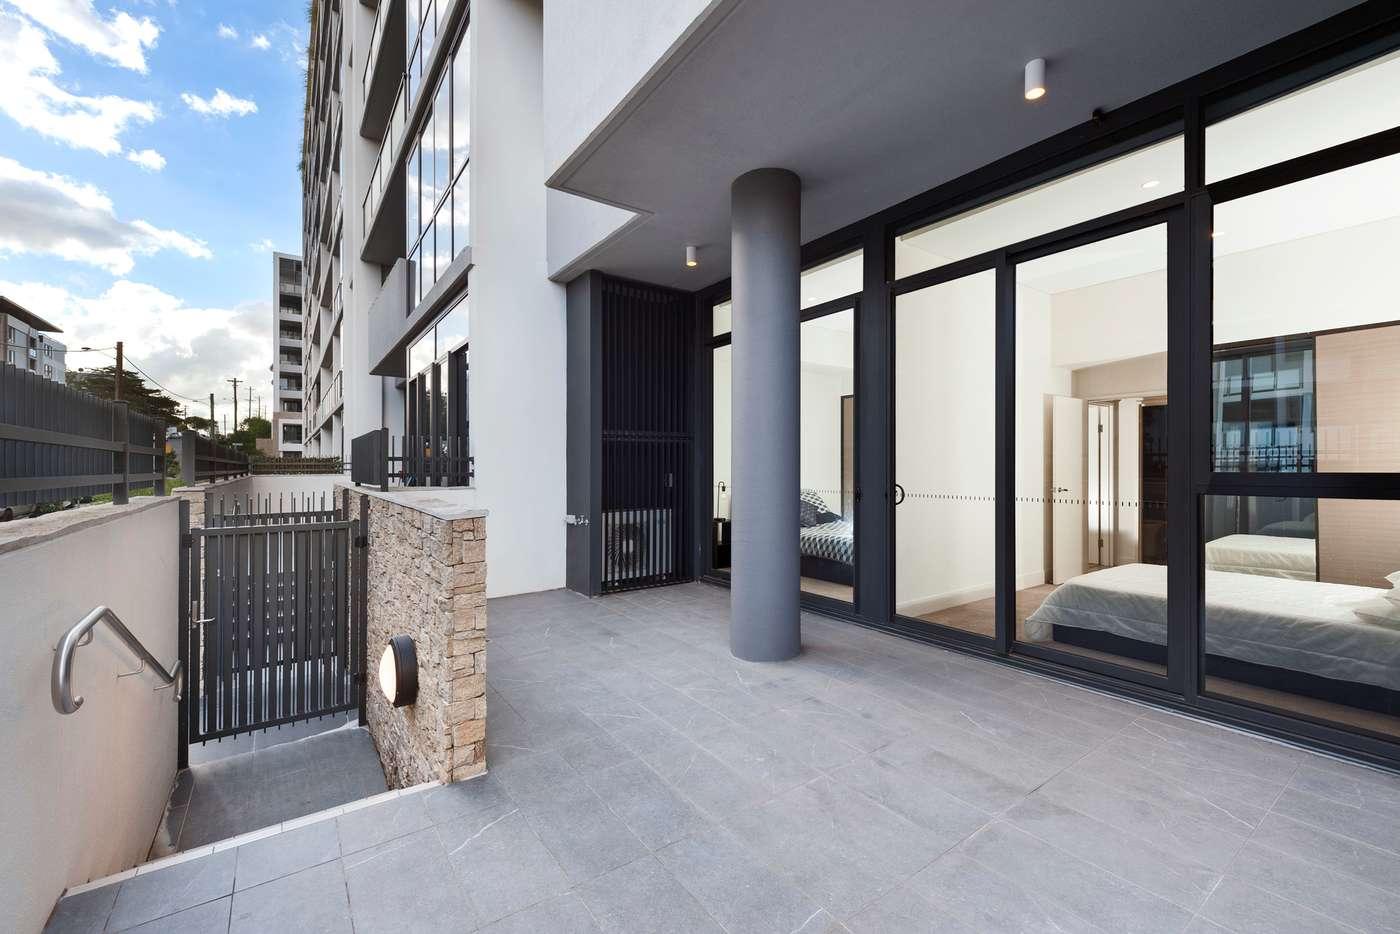 Main view of Homely apartment listing, 132/2K Morton Street, Parramatta NSW 2150